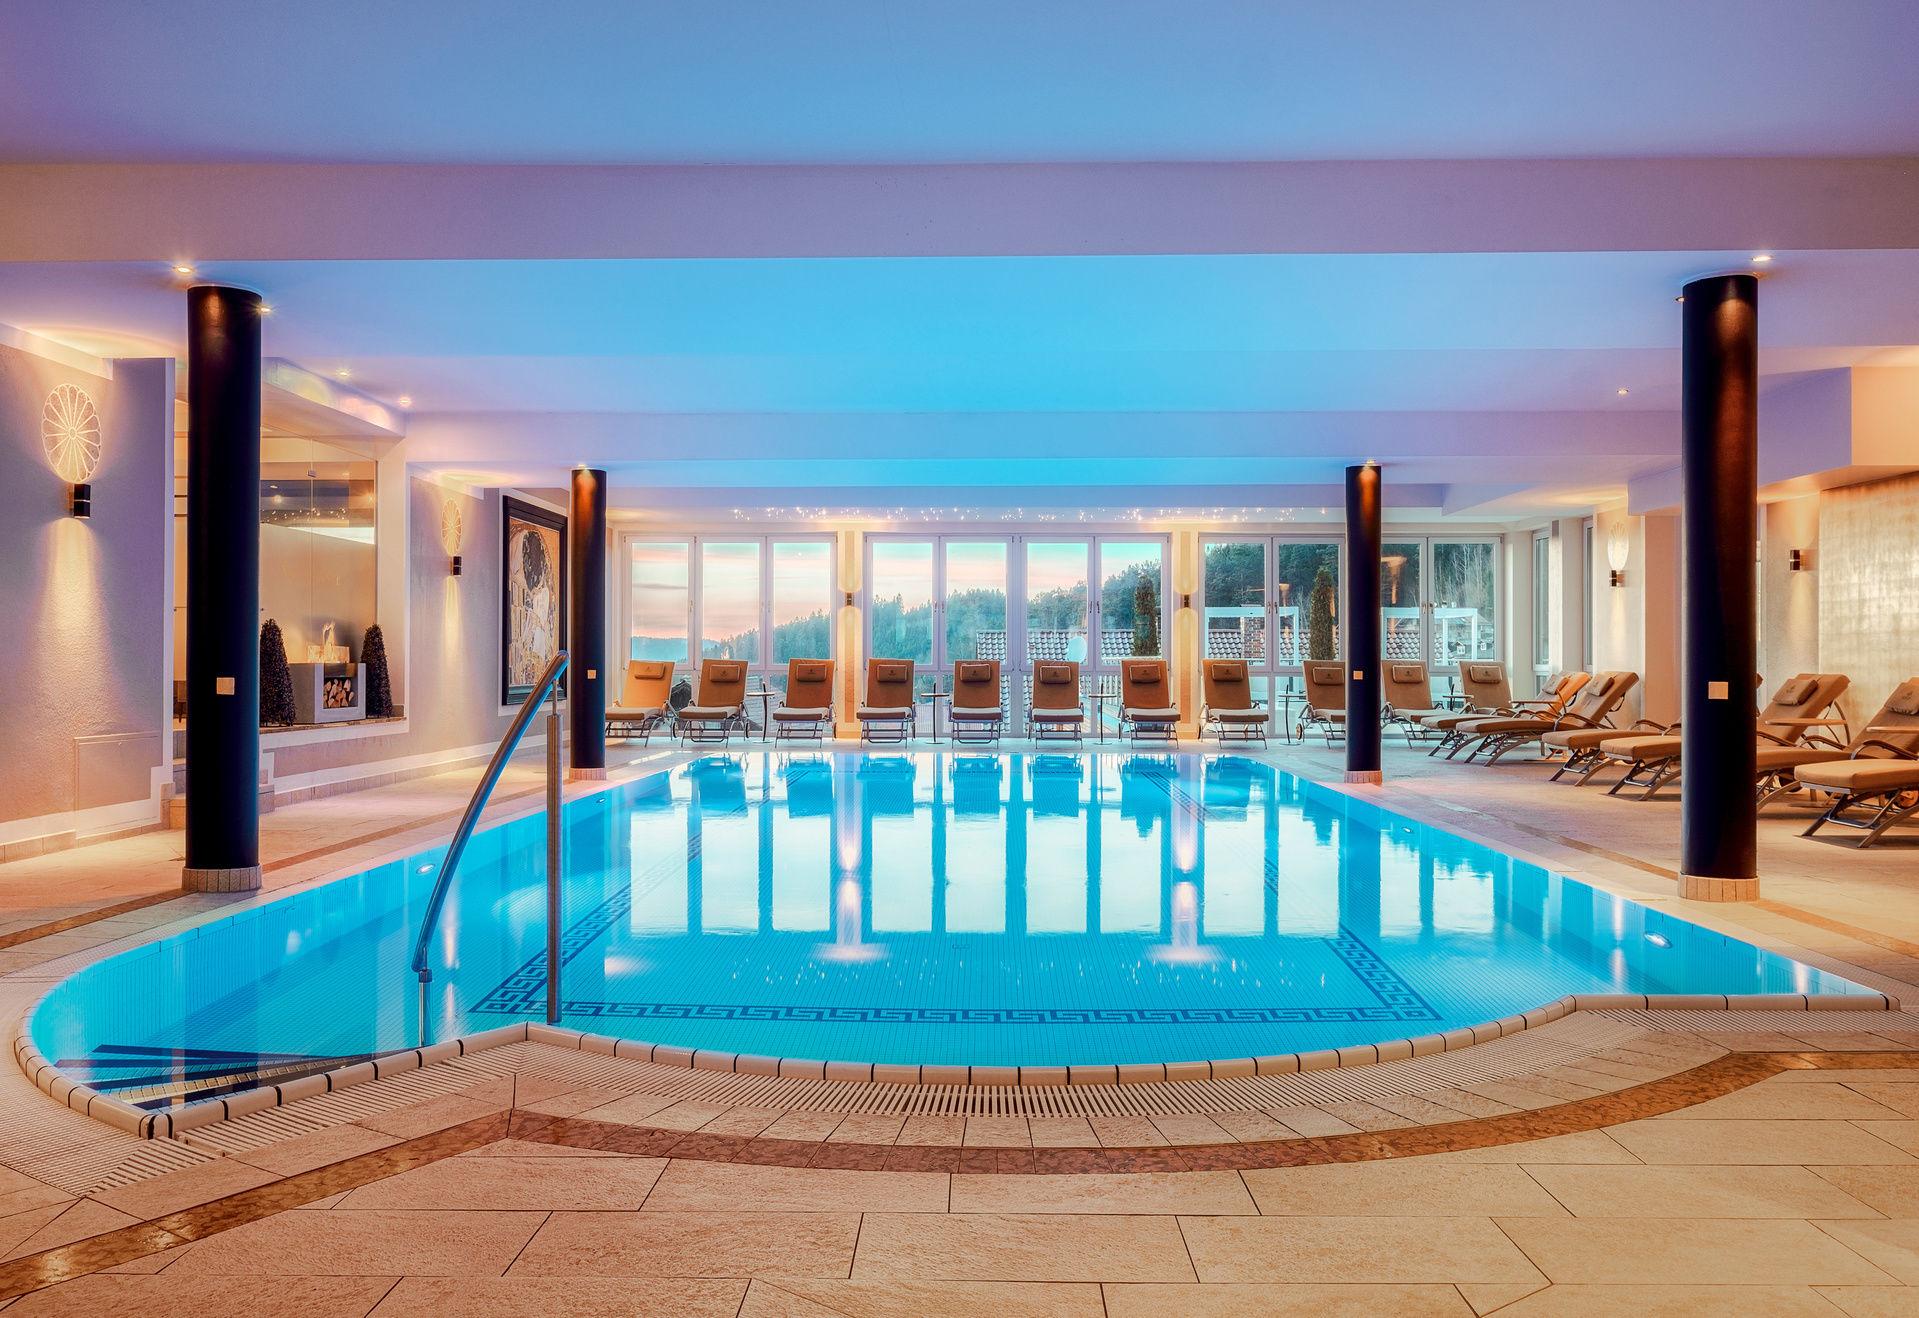 Panoramahallenbad - Wellness Hotel Bayerischer Wald ...